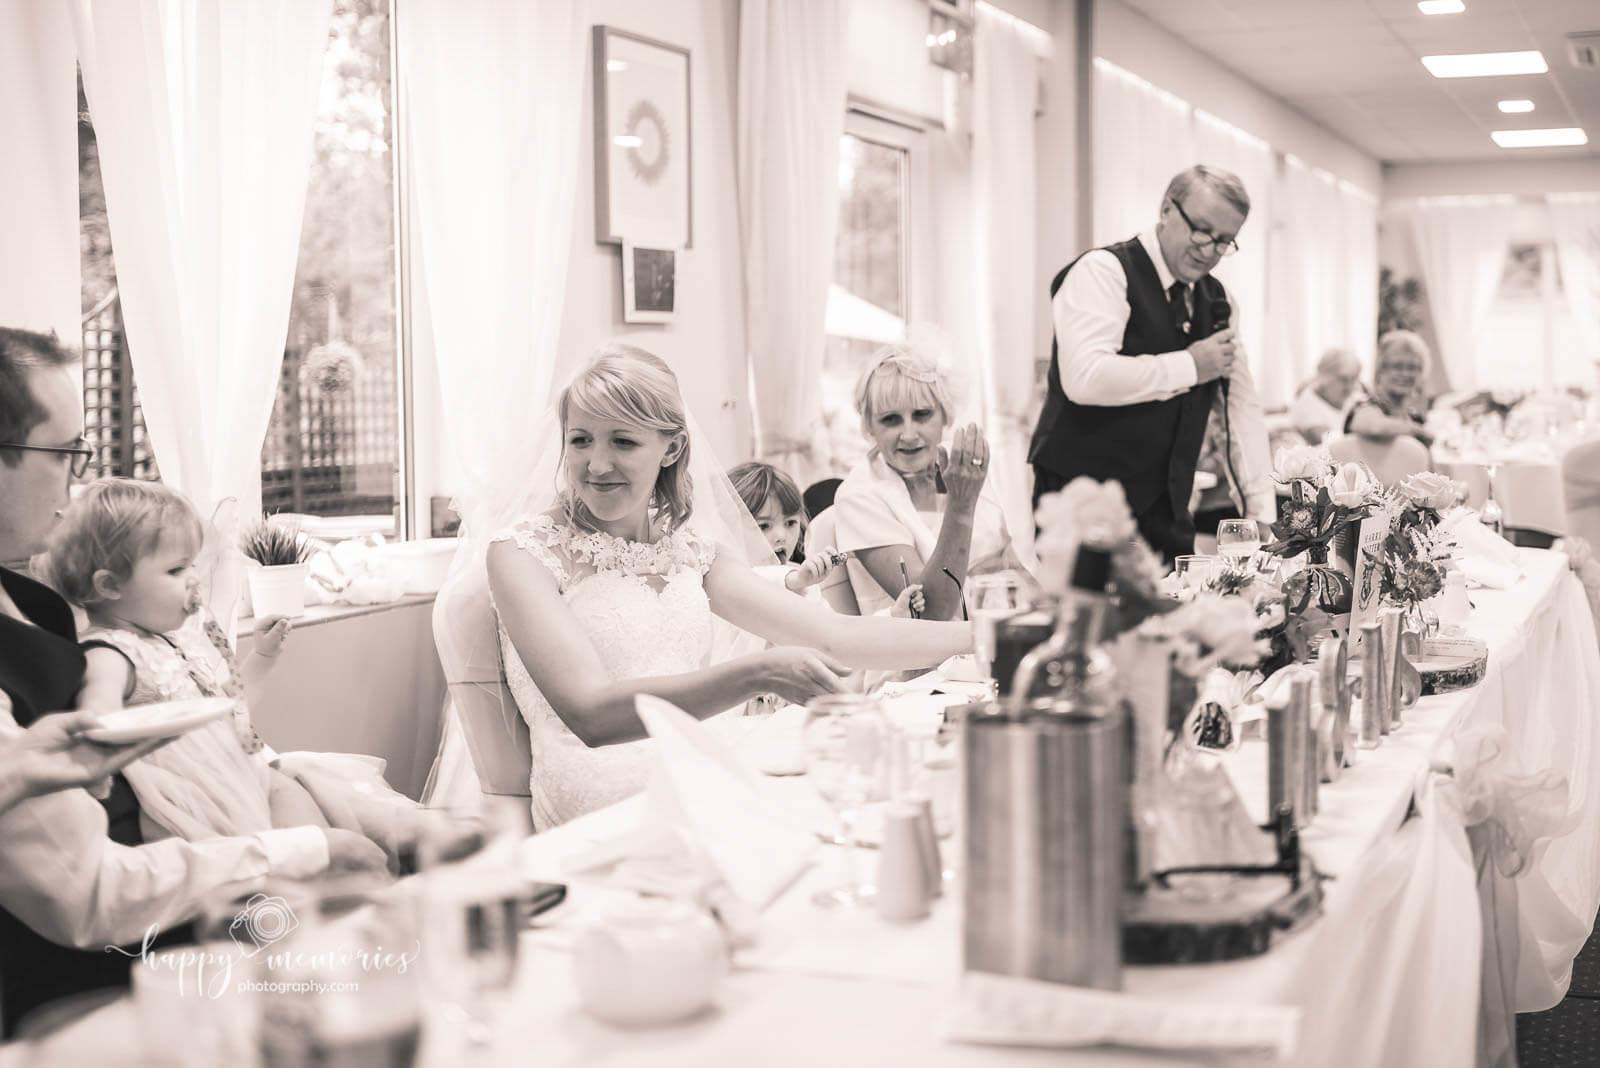 Wedding photographer East Grinstead-32